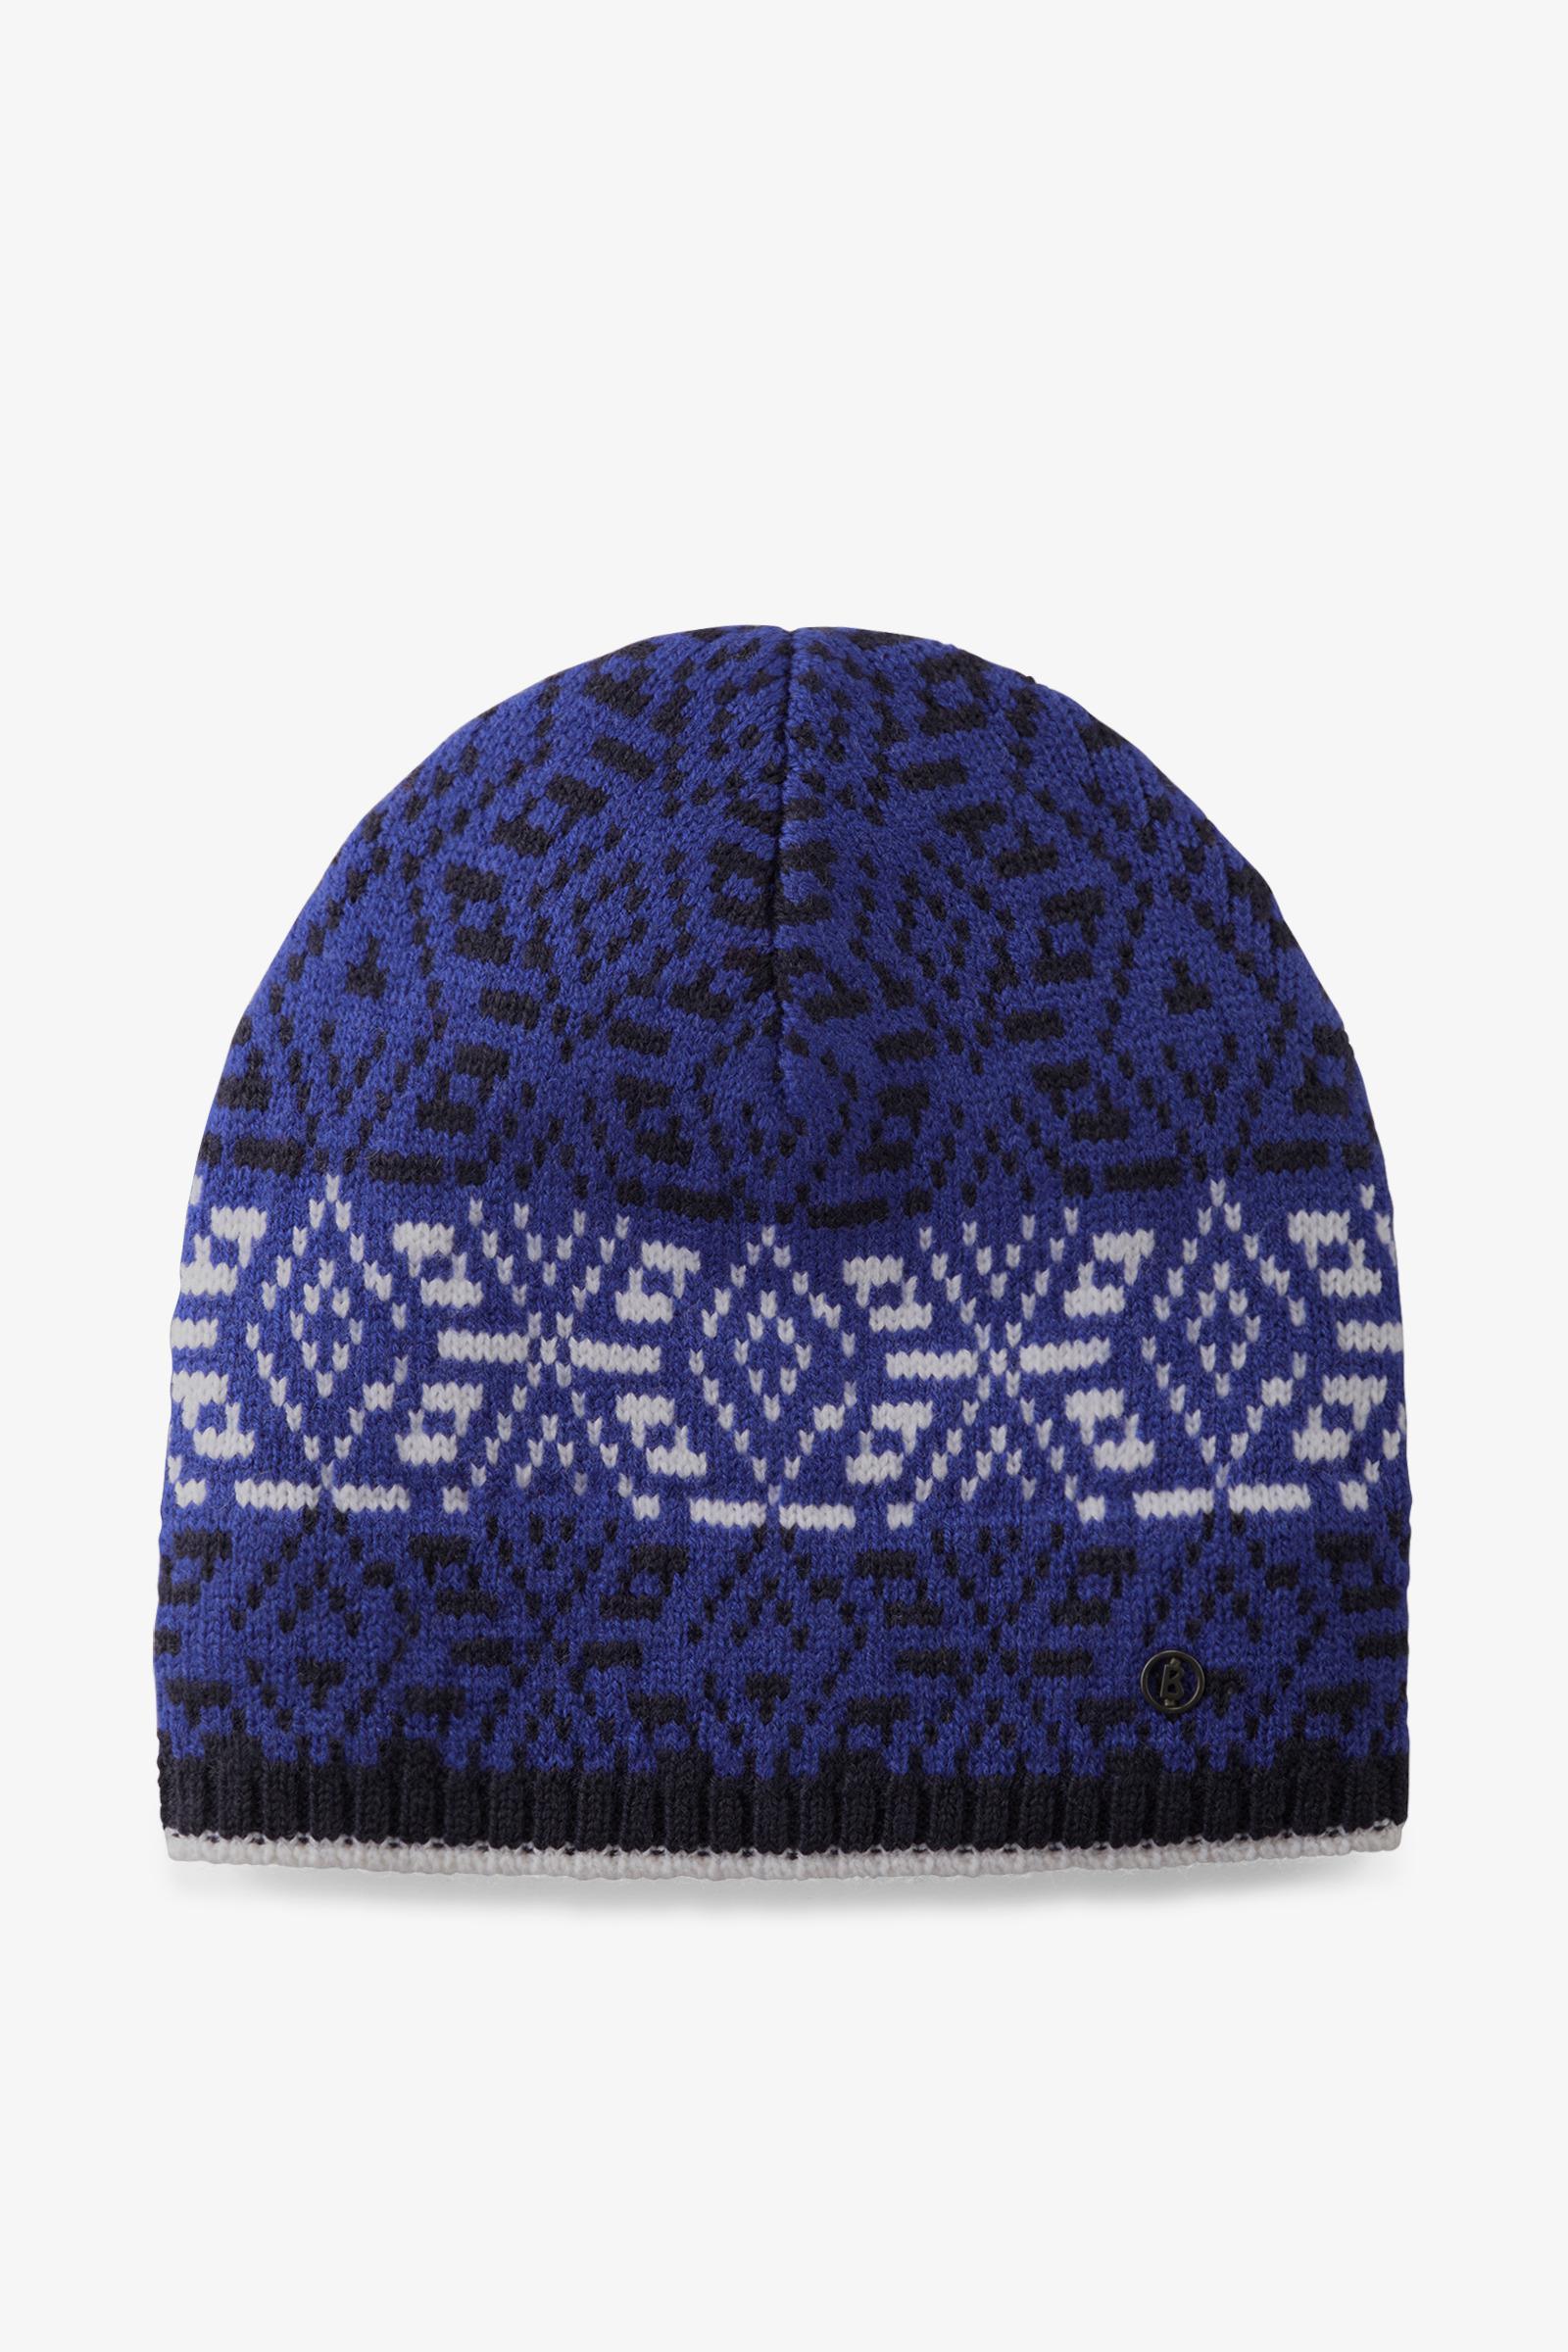 7ee348522b4b13 Bogner Trina Knitted Hat In Indigo/black/off-white in Blue - Lyst